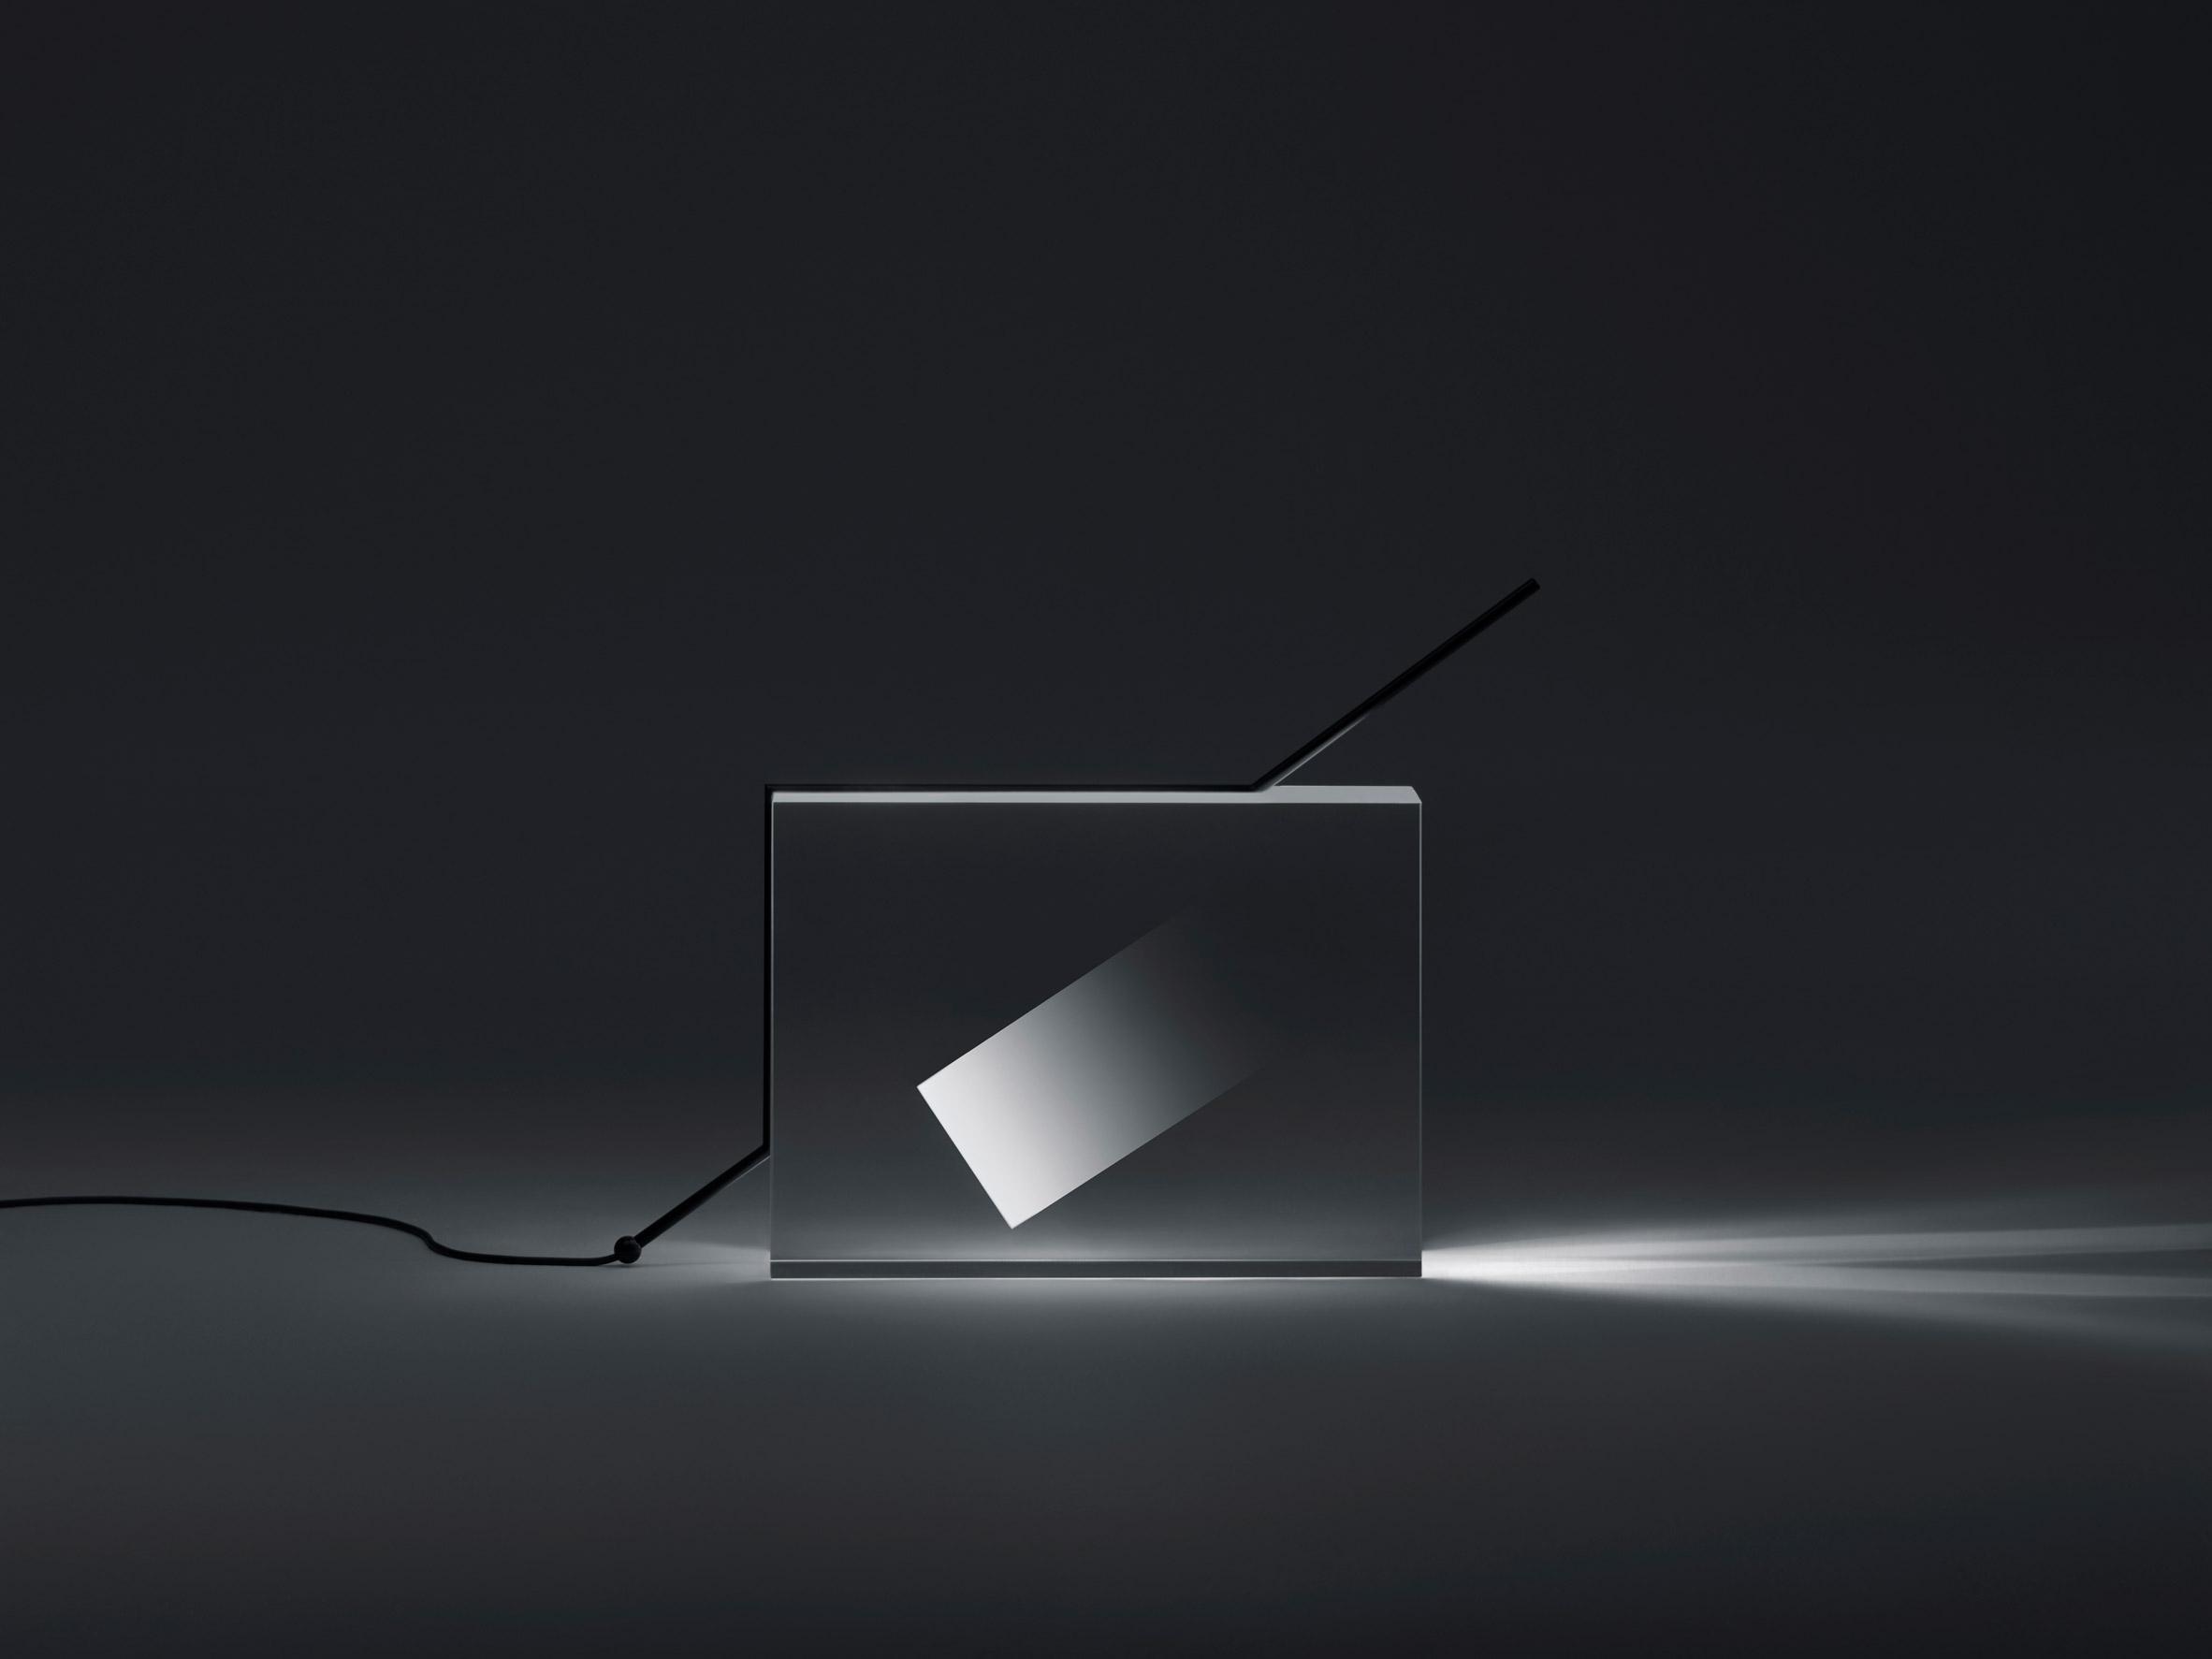 Nendo creates acrylic light sculptures in tribute to Isamu Noguchi